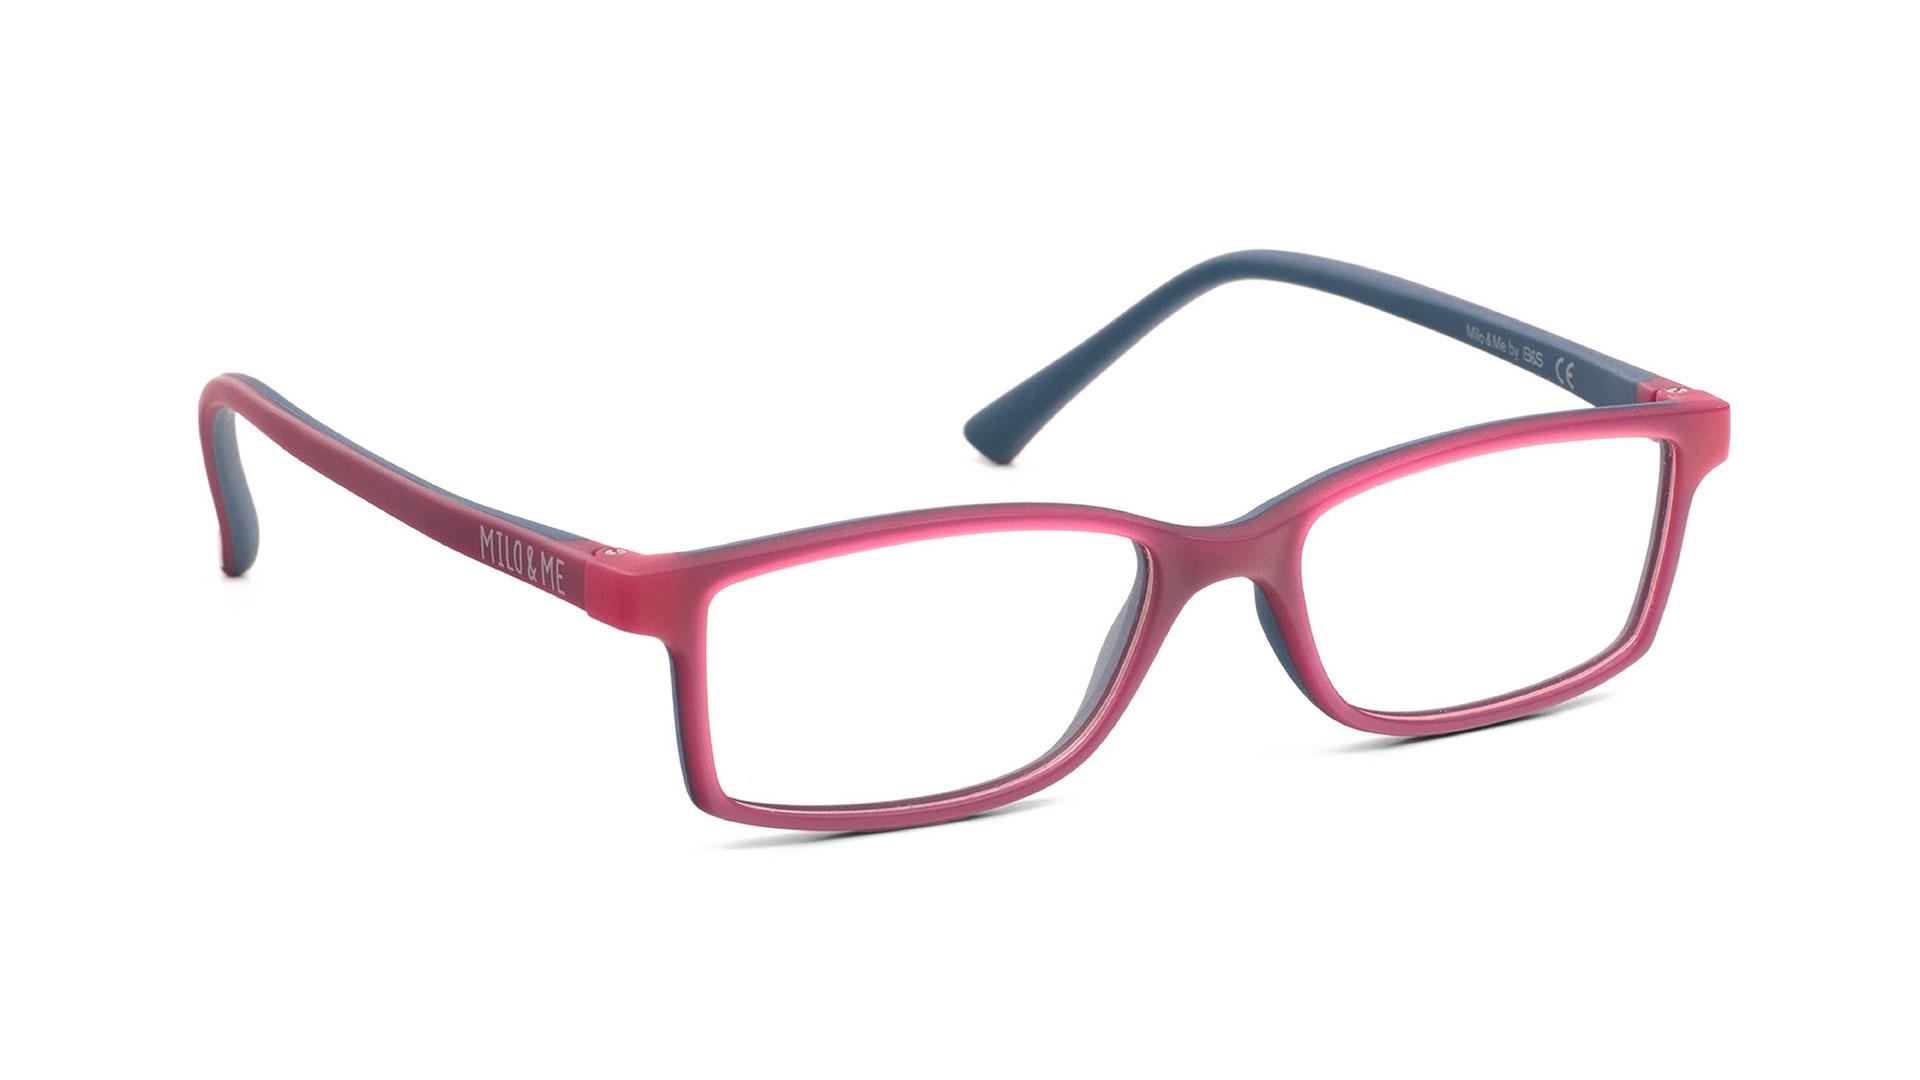 BlackberryDark Blue H85011-25 - Milo & Me Eyewear - Optimum RX Lens Specialists